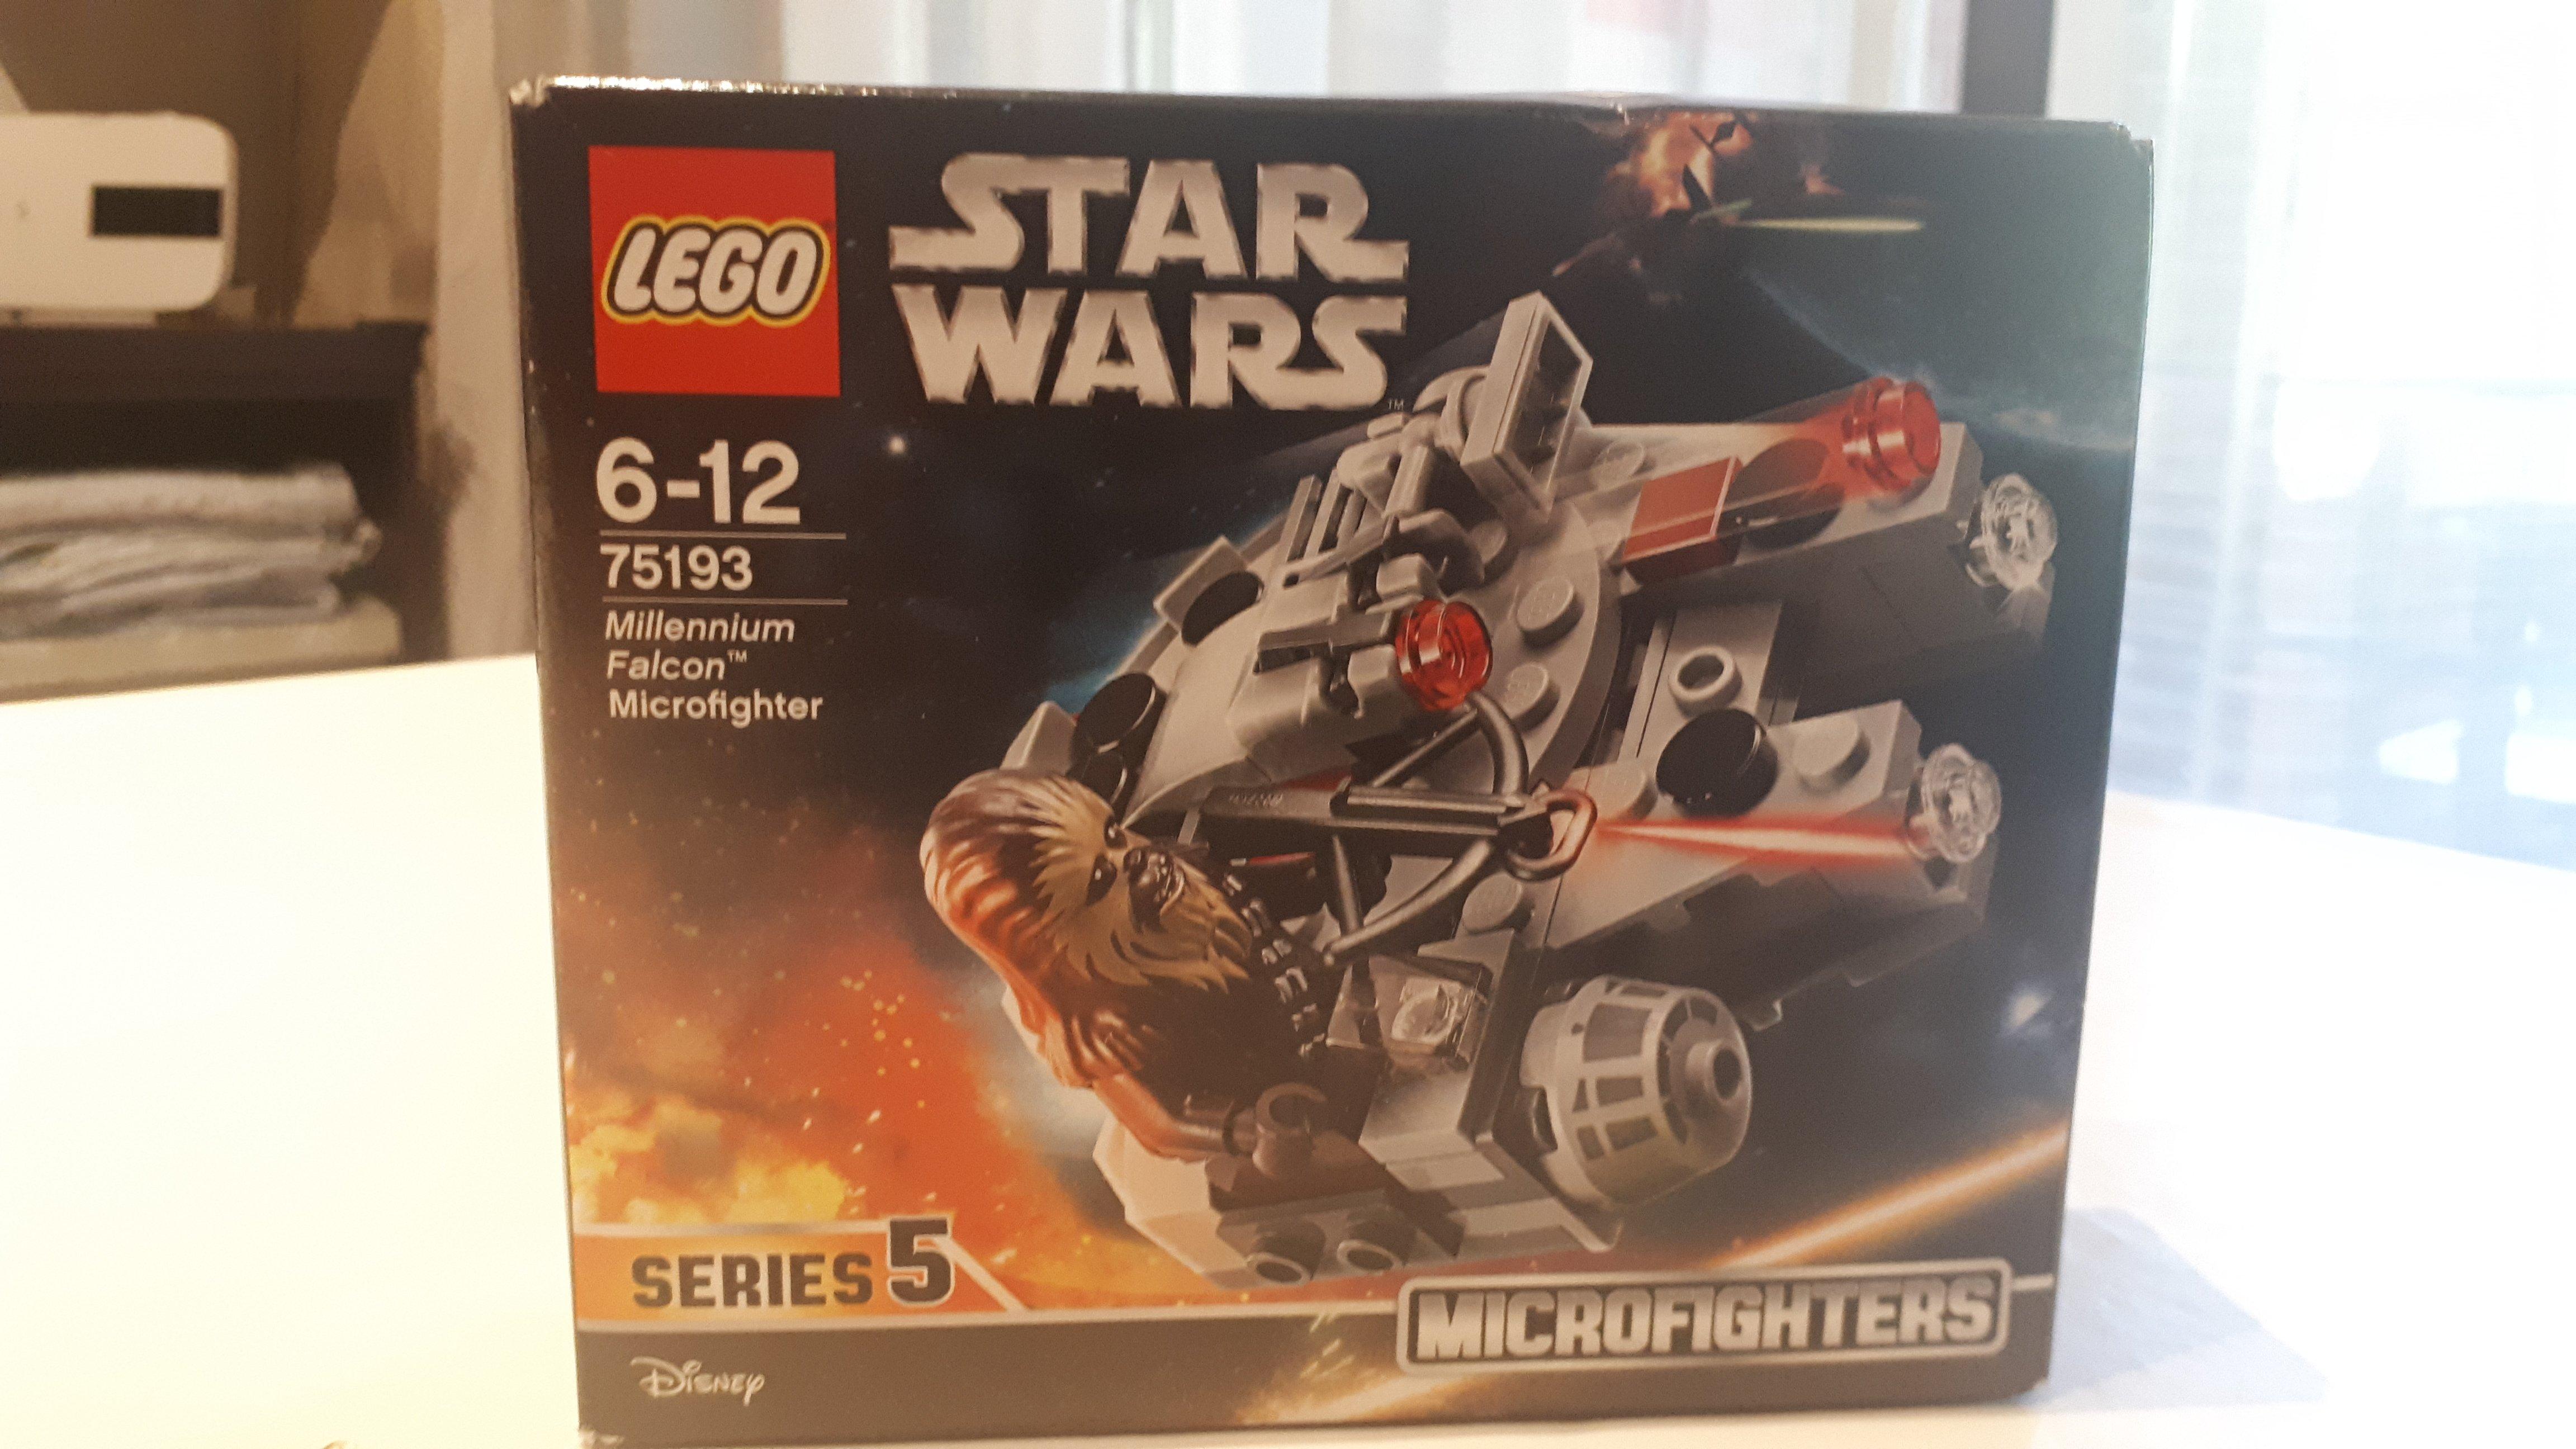 Lego Star Wars – Microfighters Millennium Falcon